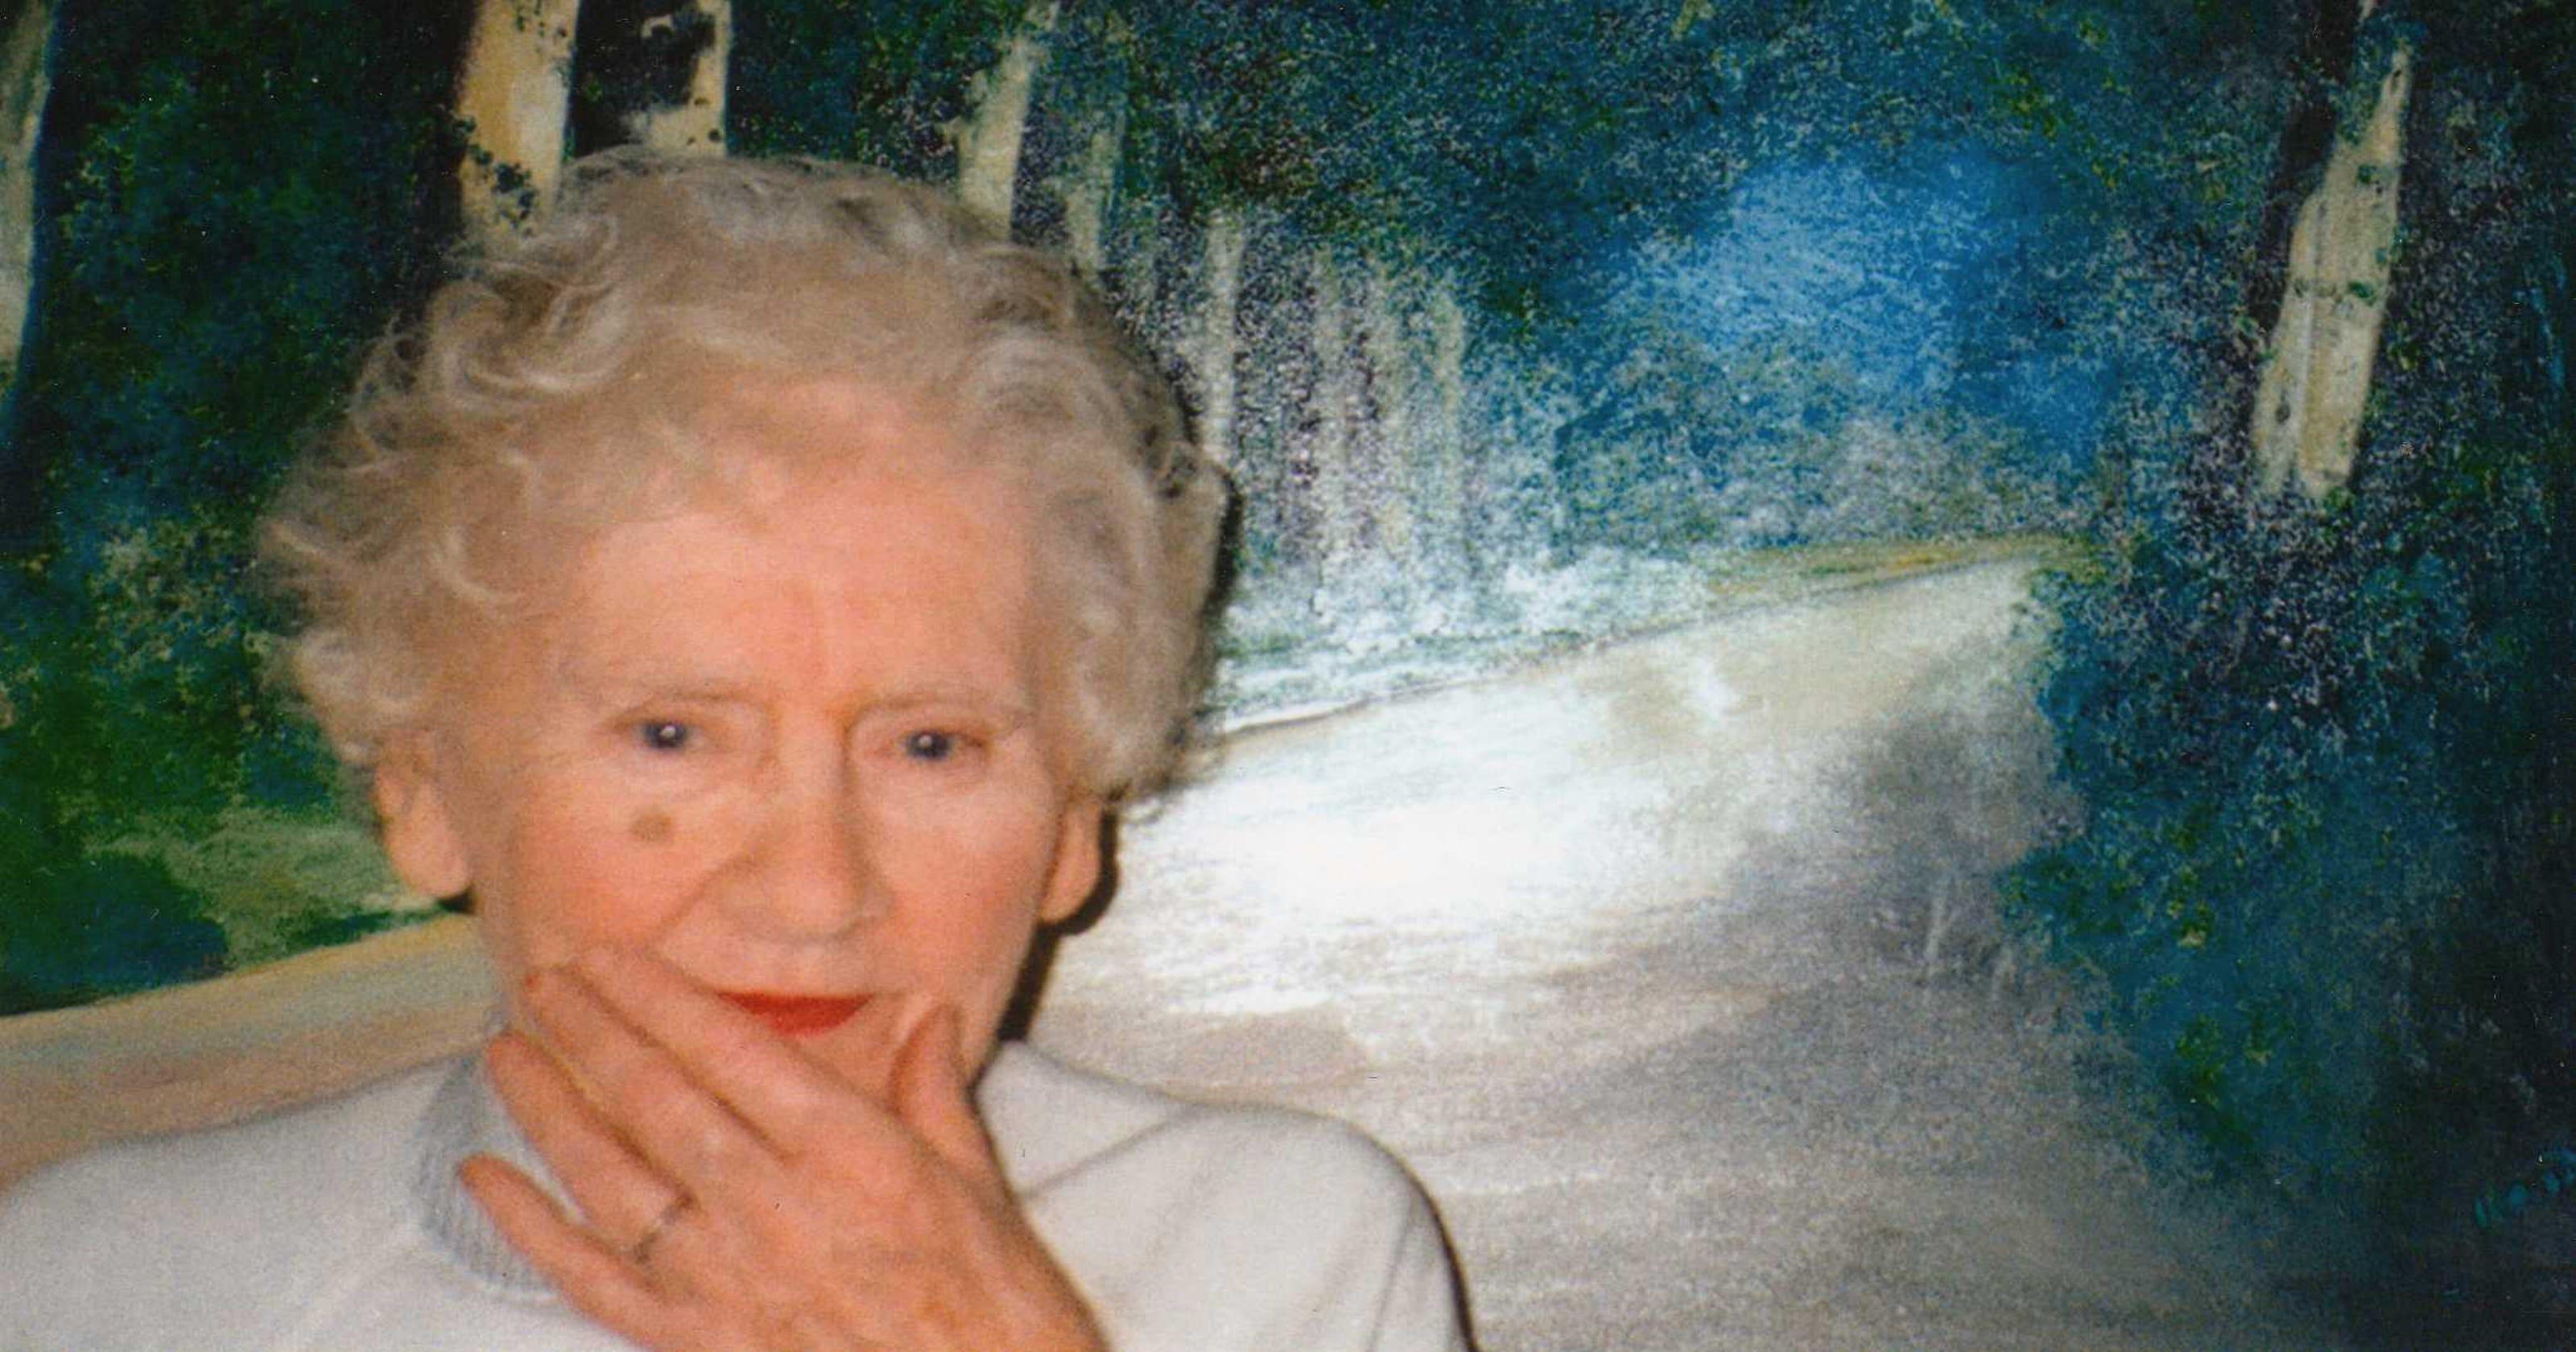 World's oldest romance novelist dies at 105